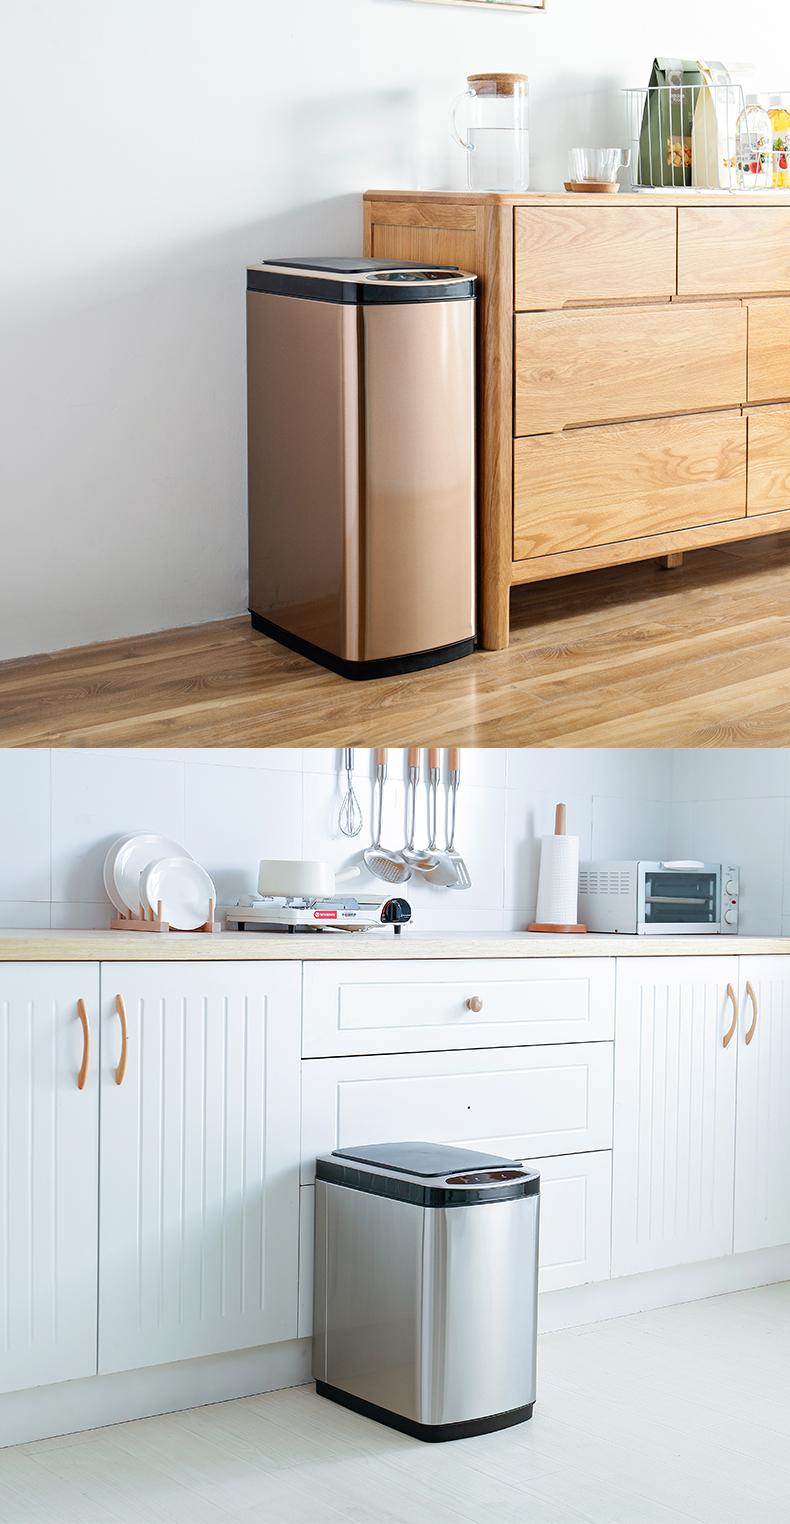 Sensor garbage bin for kitchen